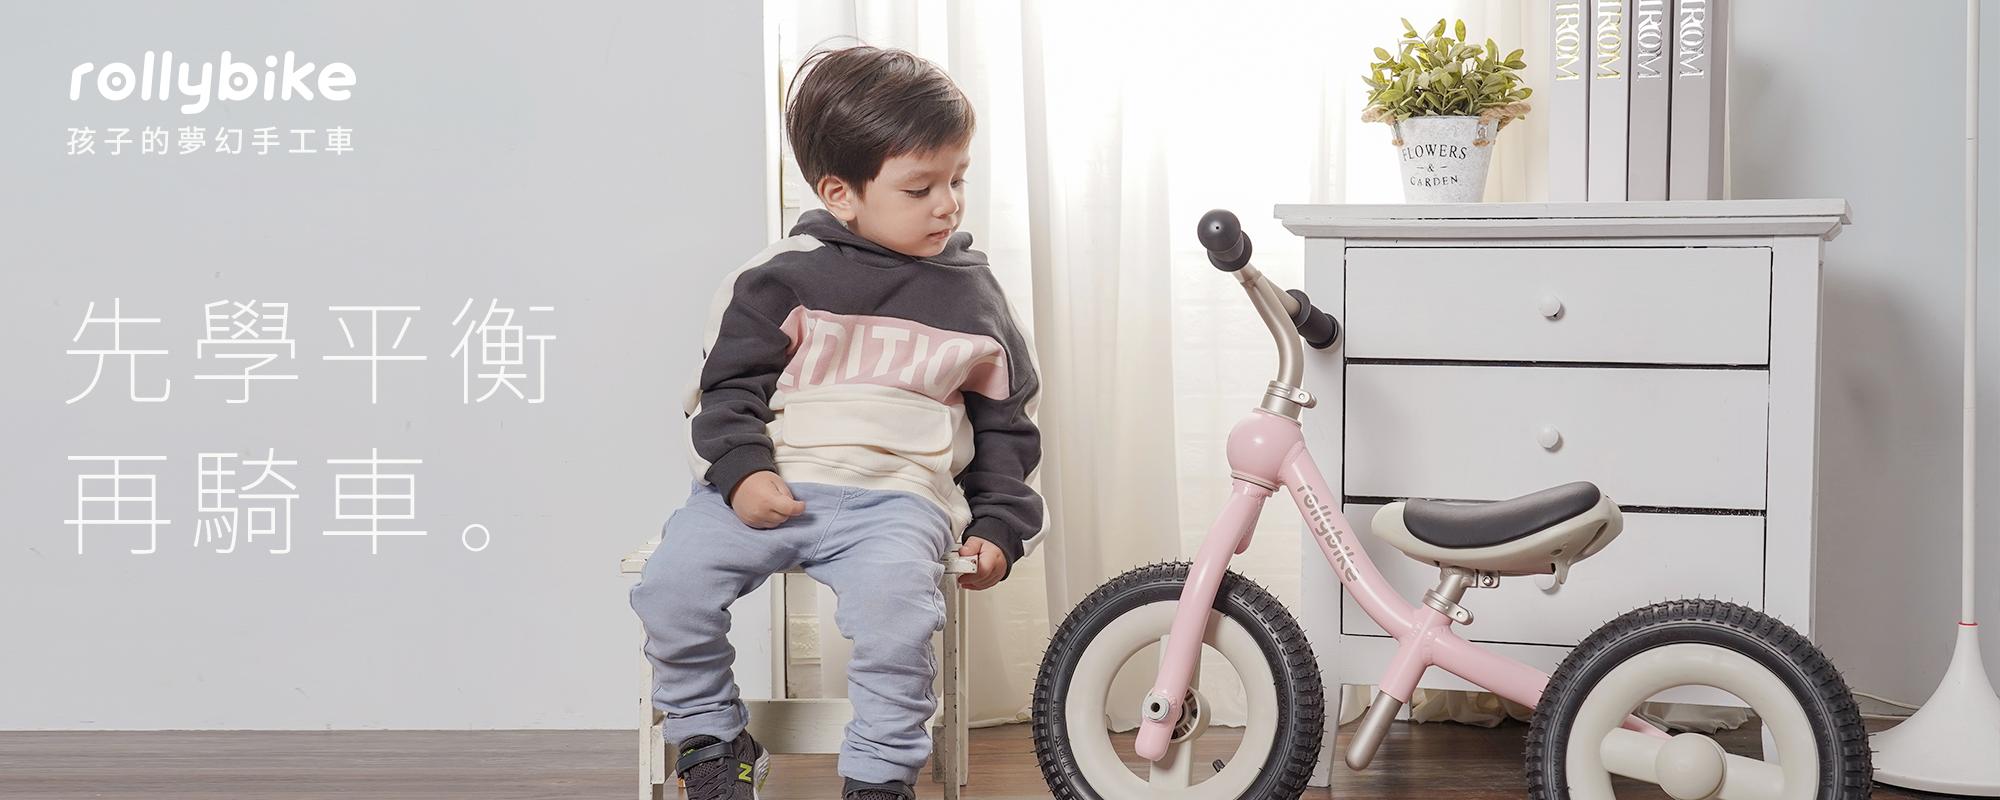 rollybike pushbike